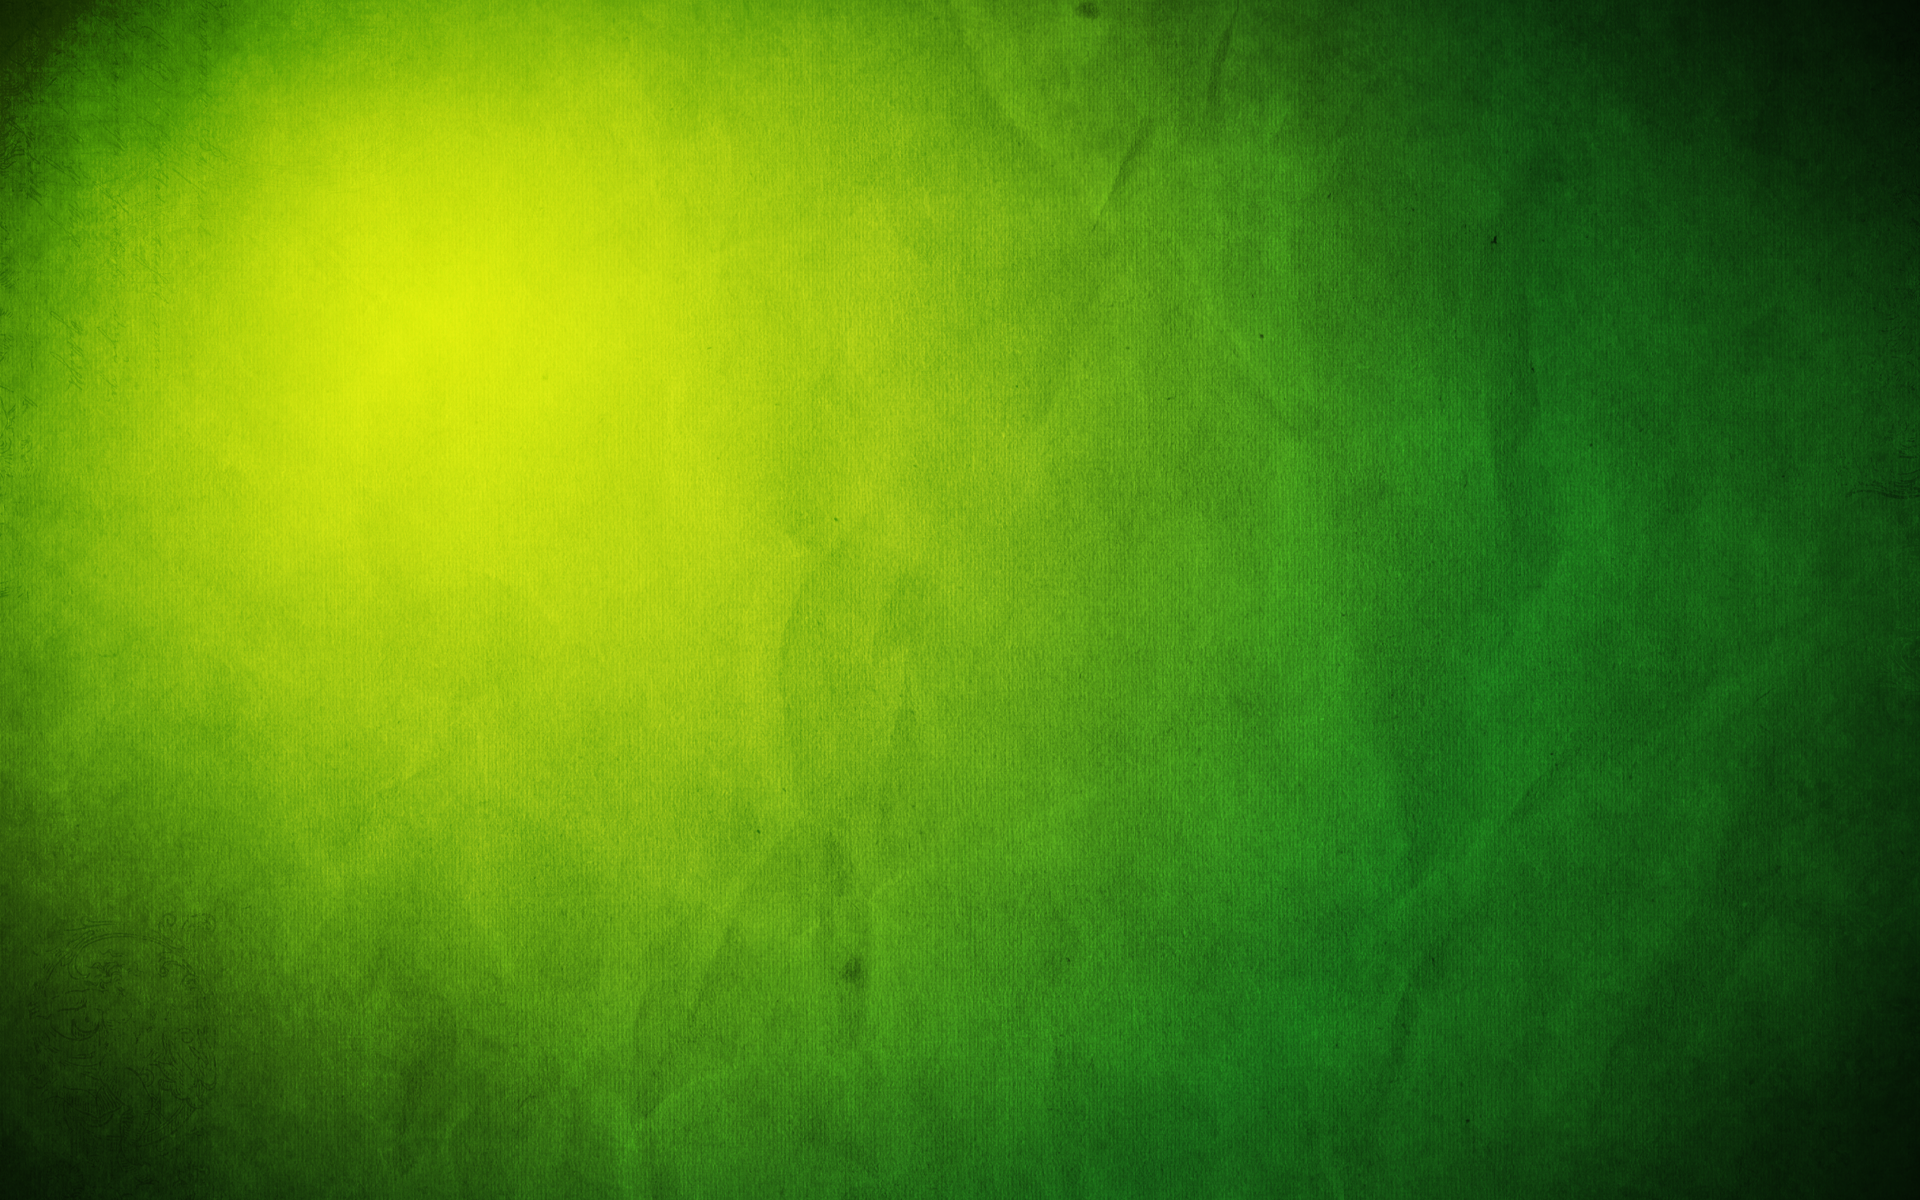 Green Background Wallpaper 613374